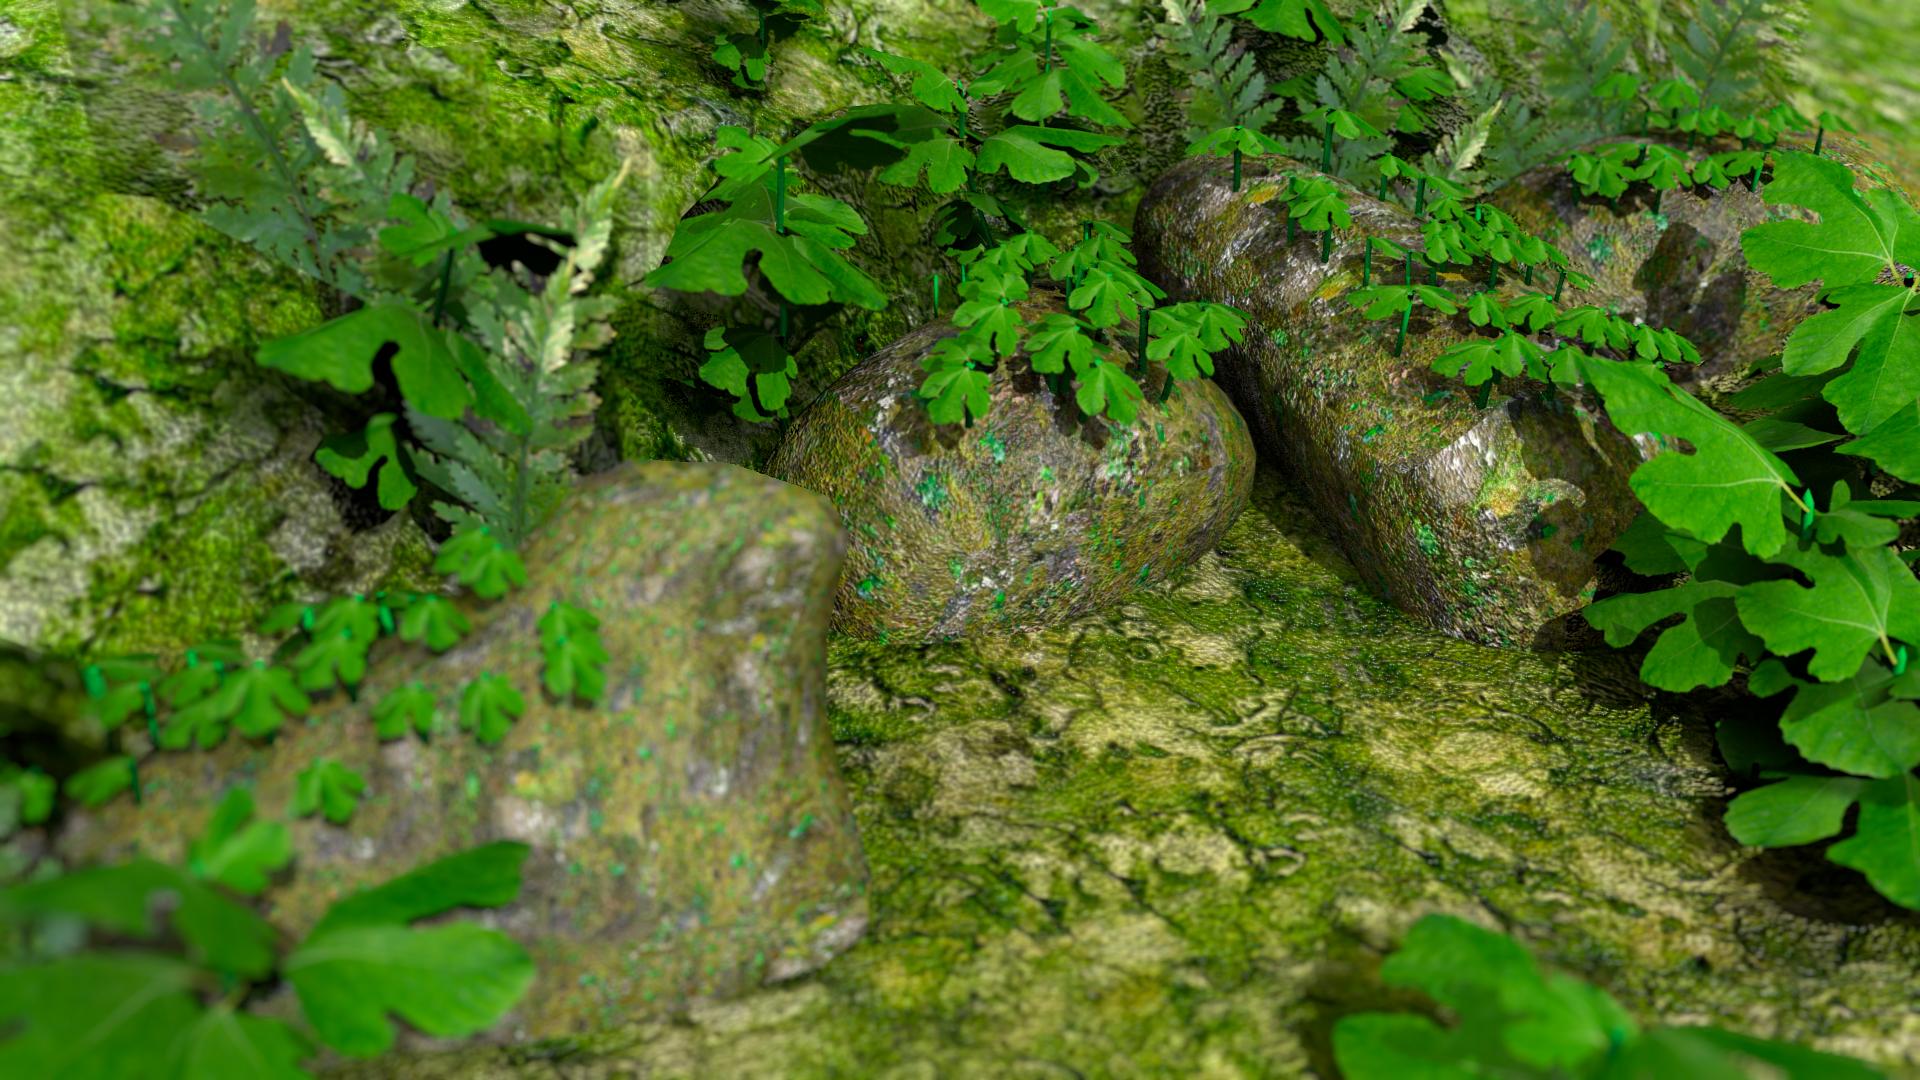 Piece of Swamp